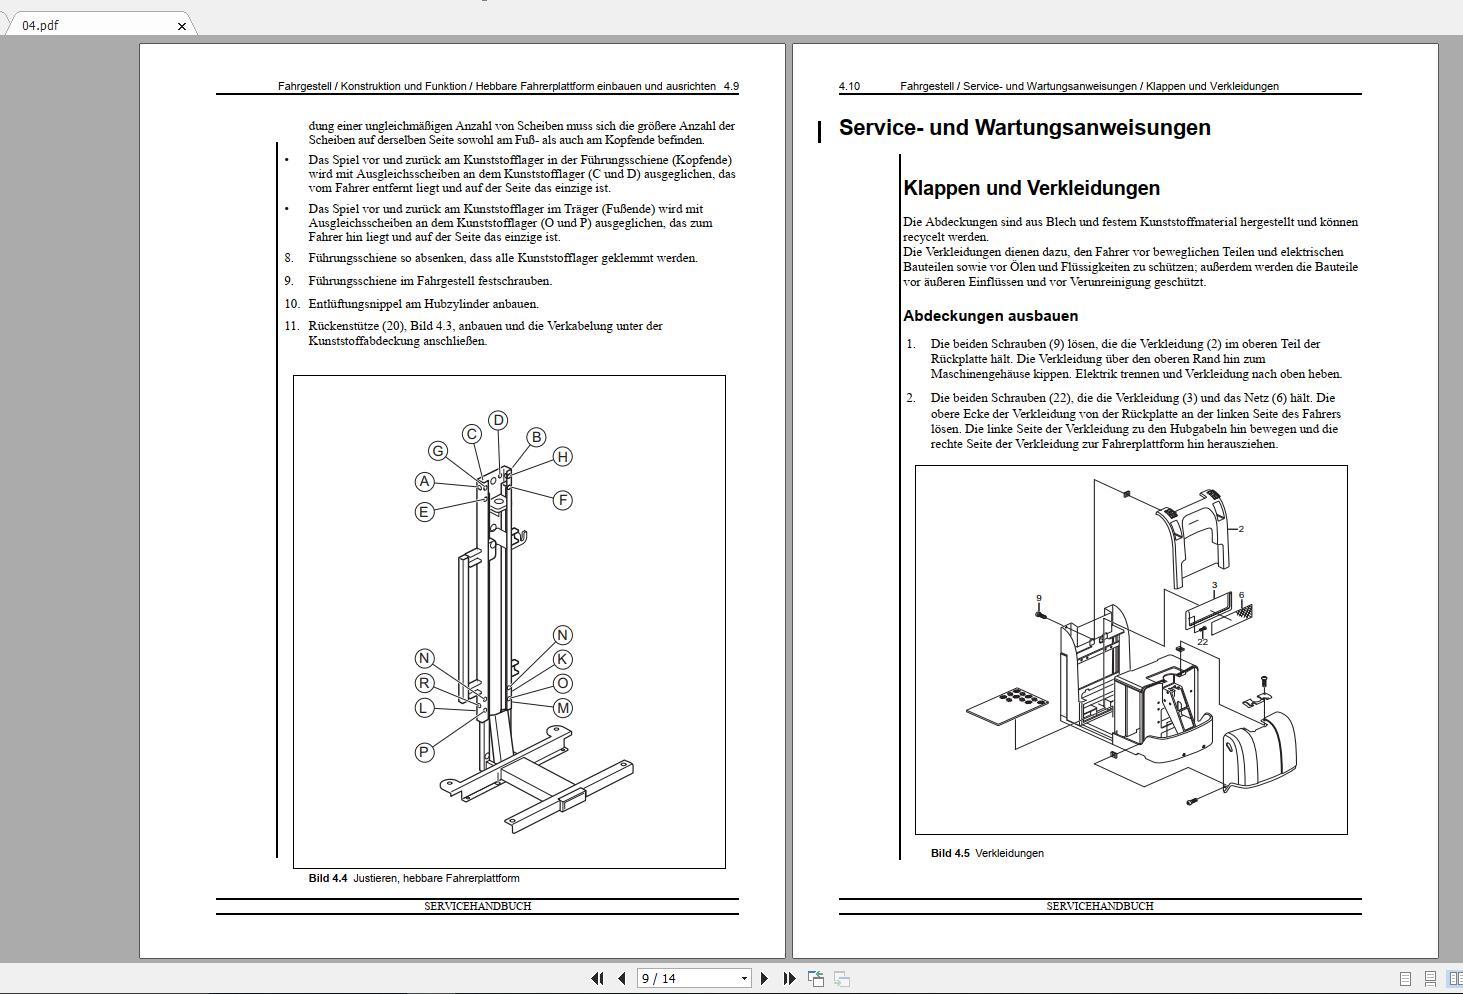 Nissan_Forklift_Warehouse_PP_Series_119036-119037_Service_ManualENDE_3